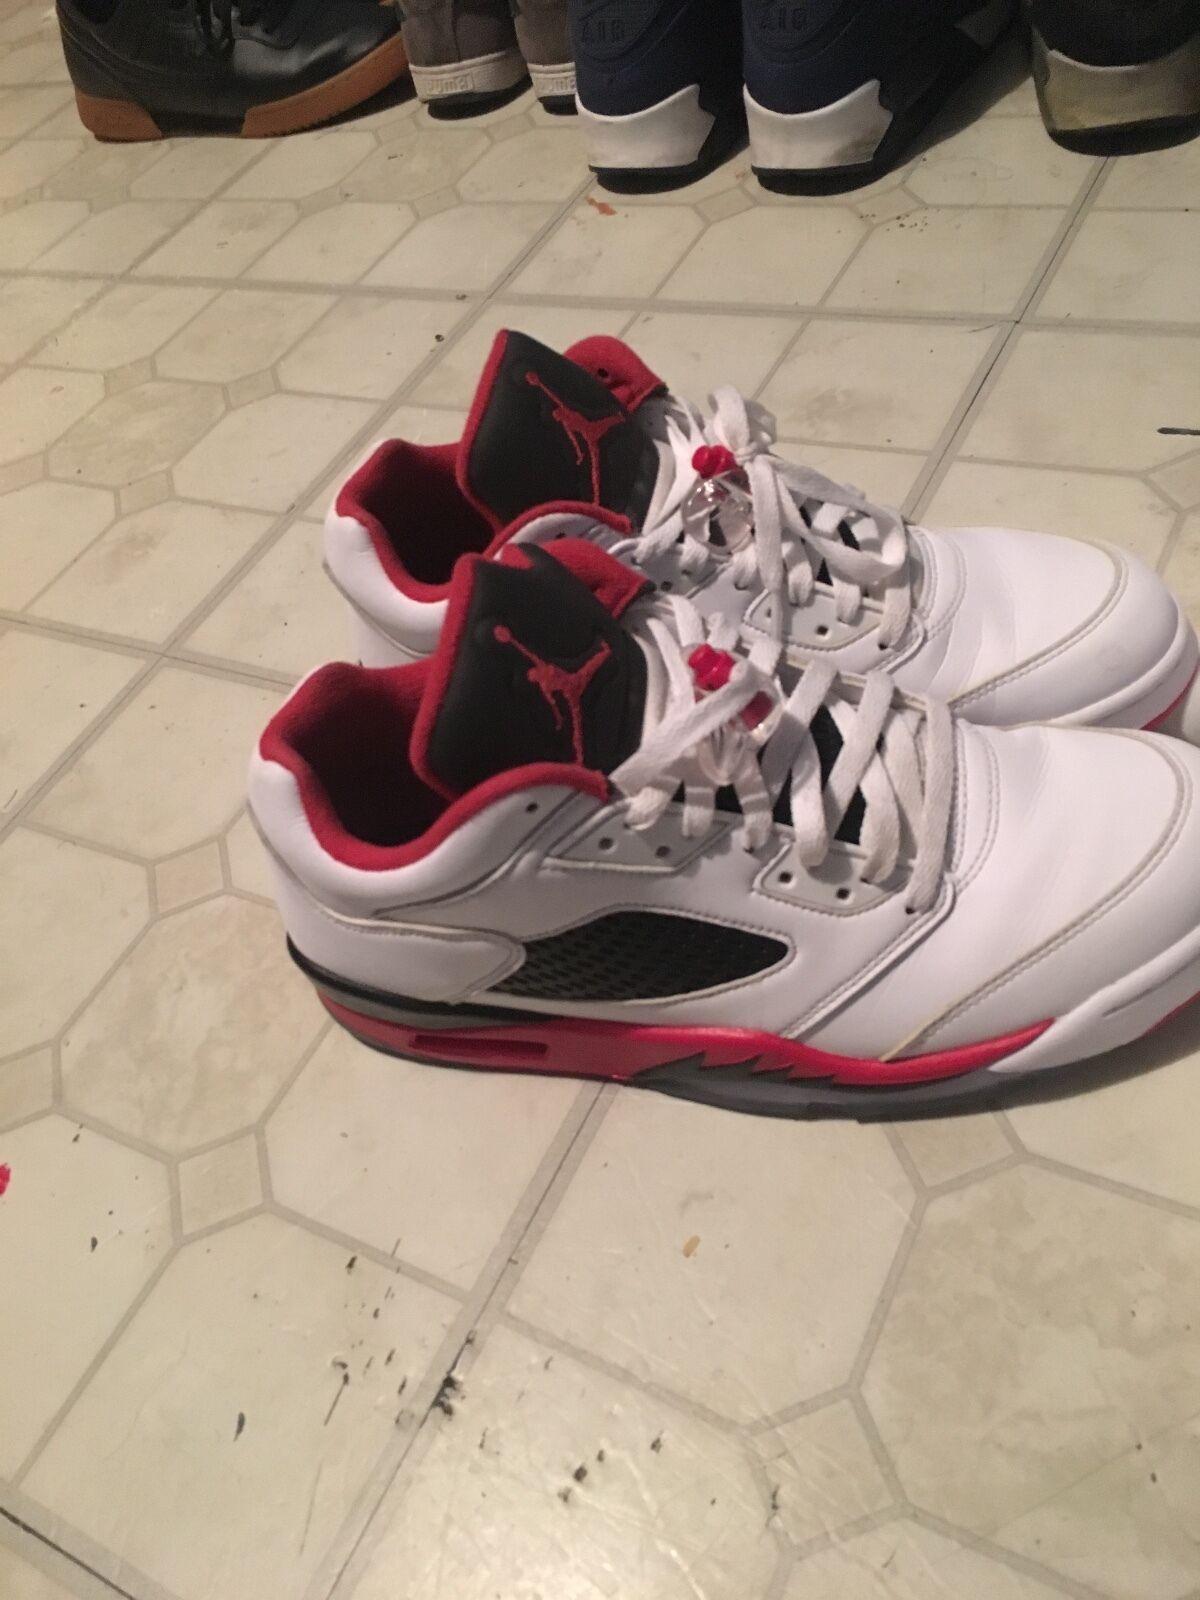 Nike Air Jordan V 5 Retro Low FIRE RED 10.5 white black red Brand discount